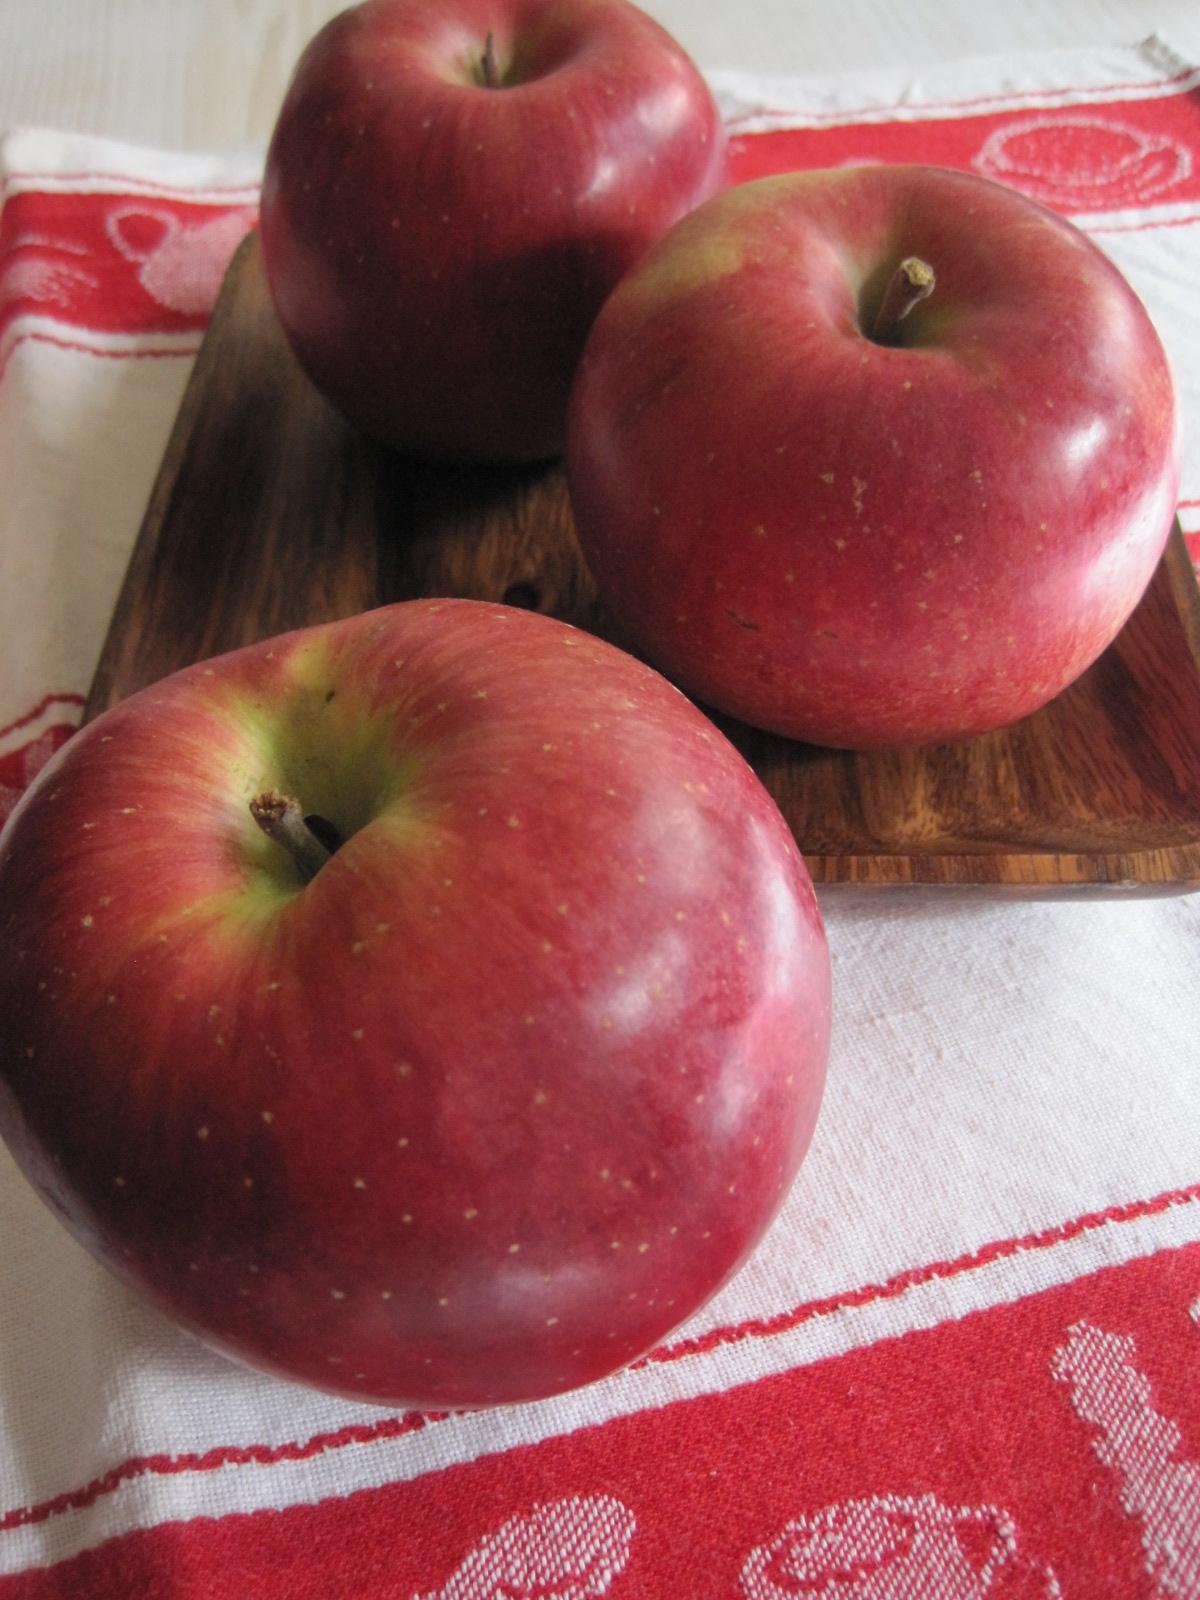 Romi-Unie の美味しいジャムと 信州のリンゴ♪_f0236260_1115337.jpg